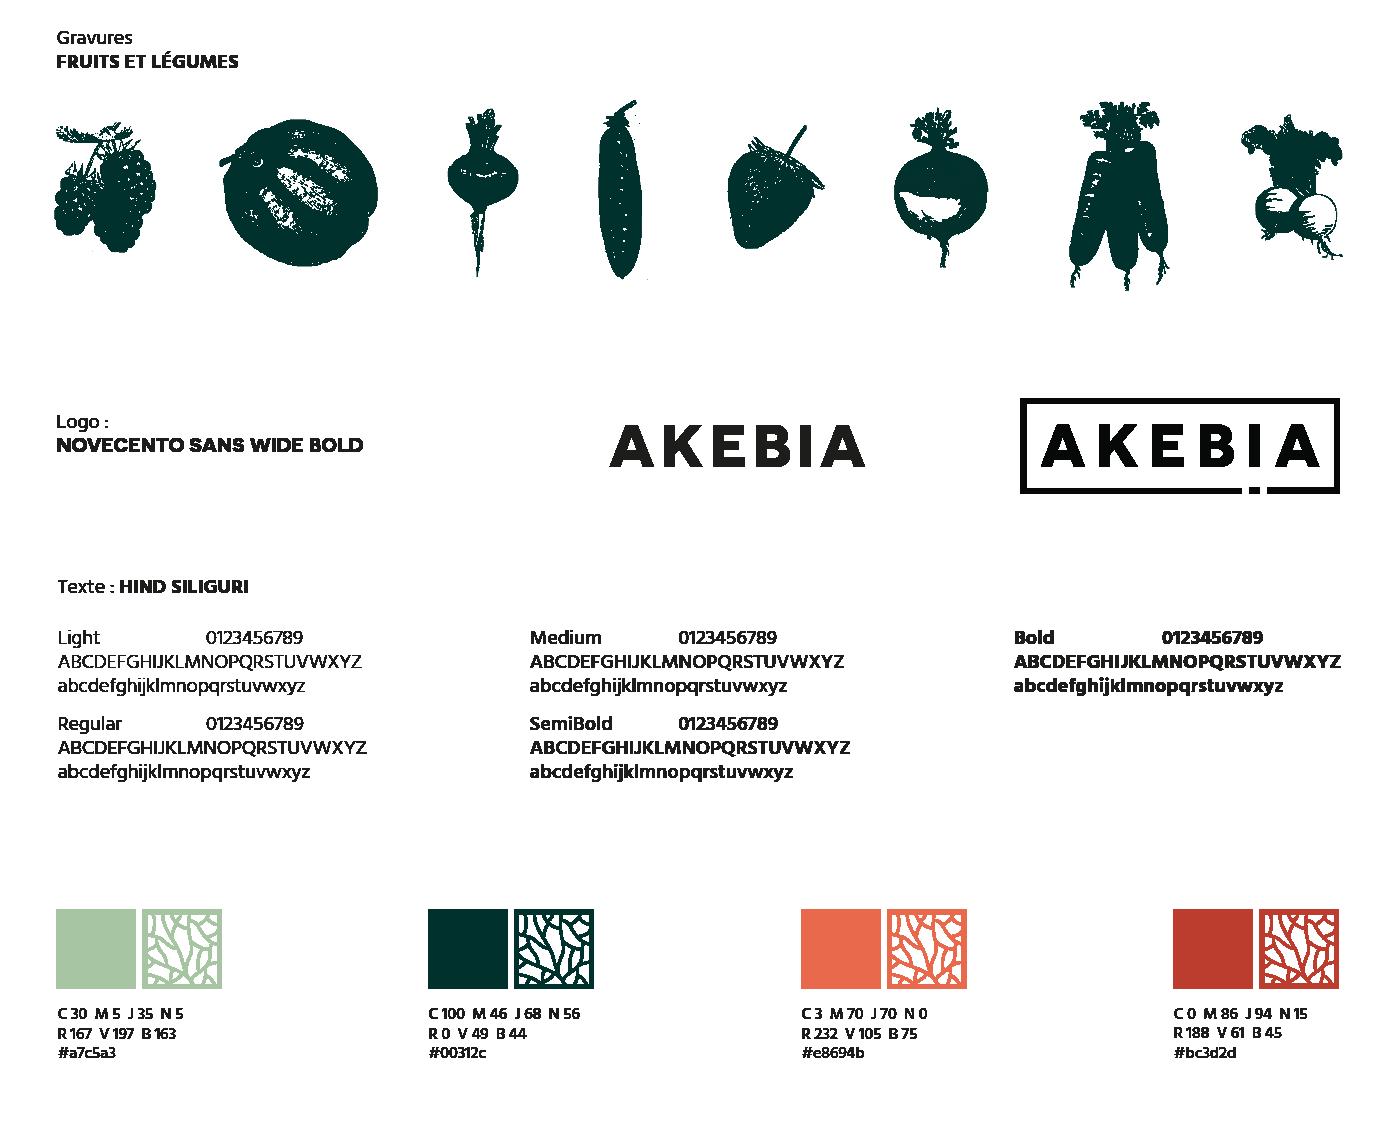 superfruit-akebia-charte-couleur-typo